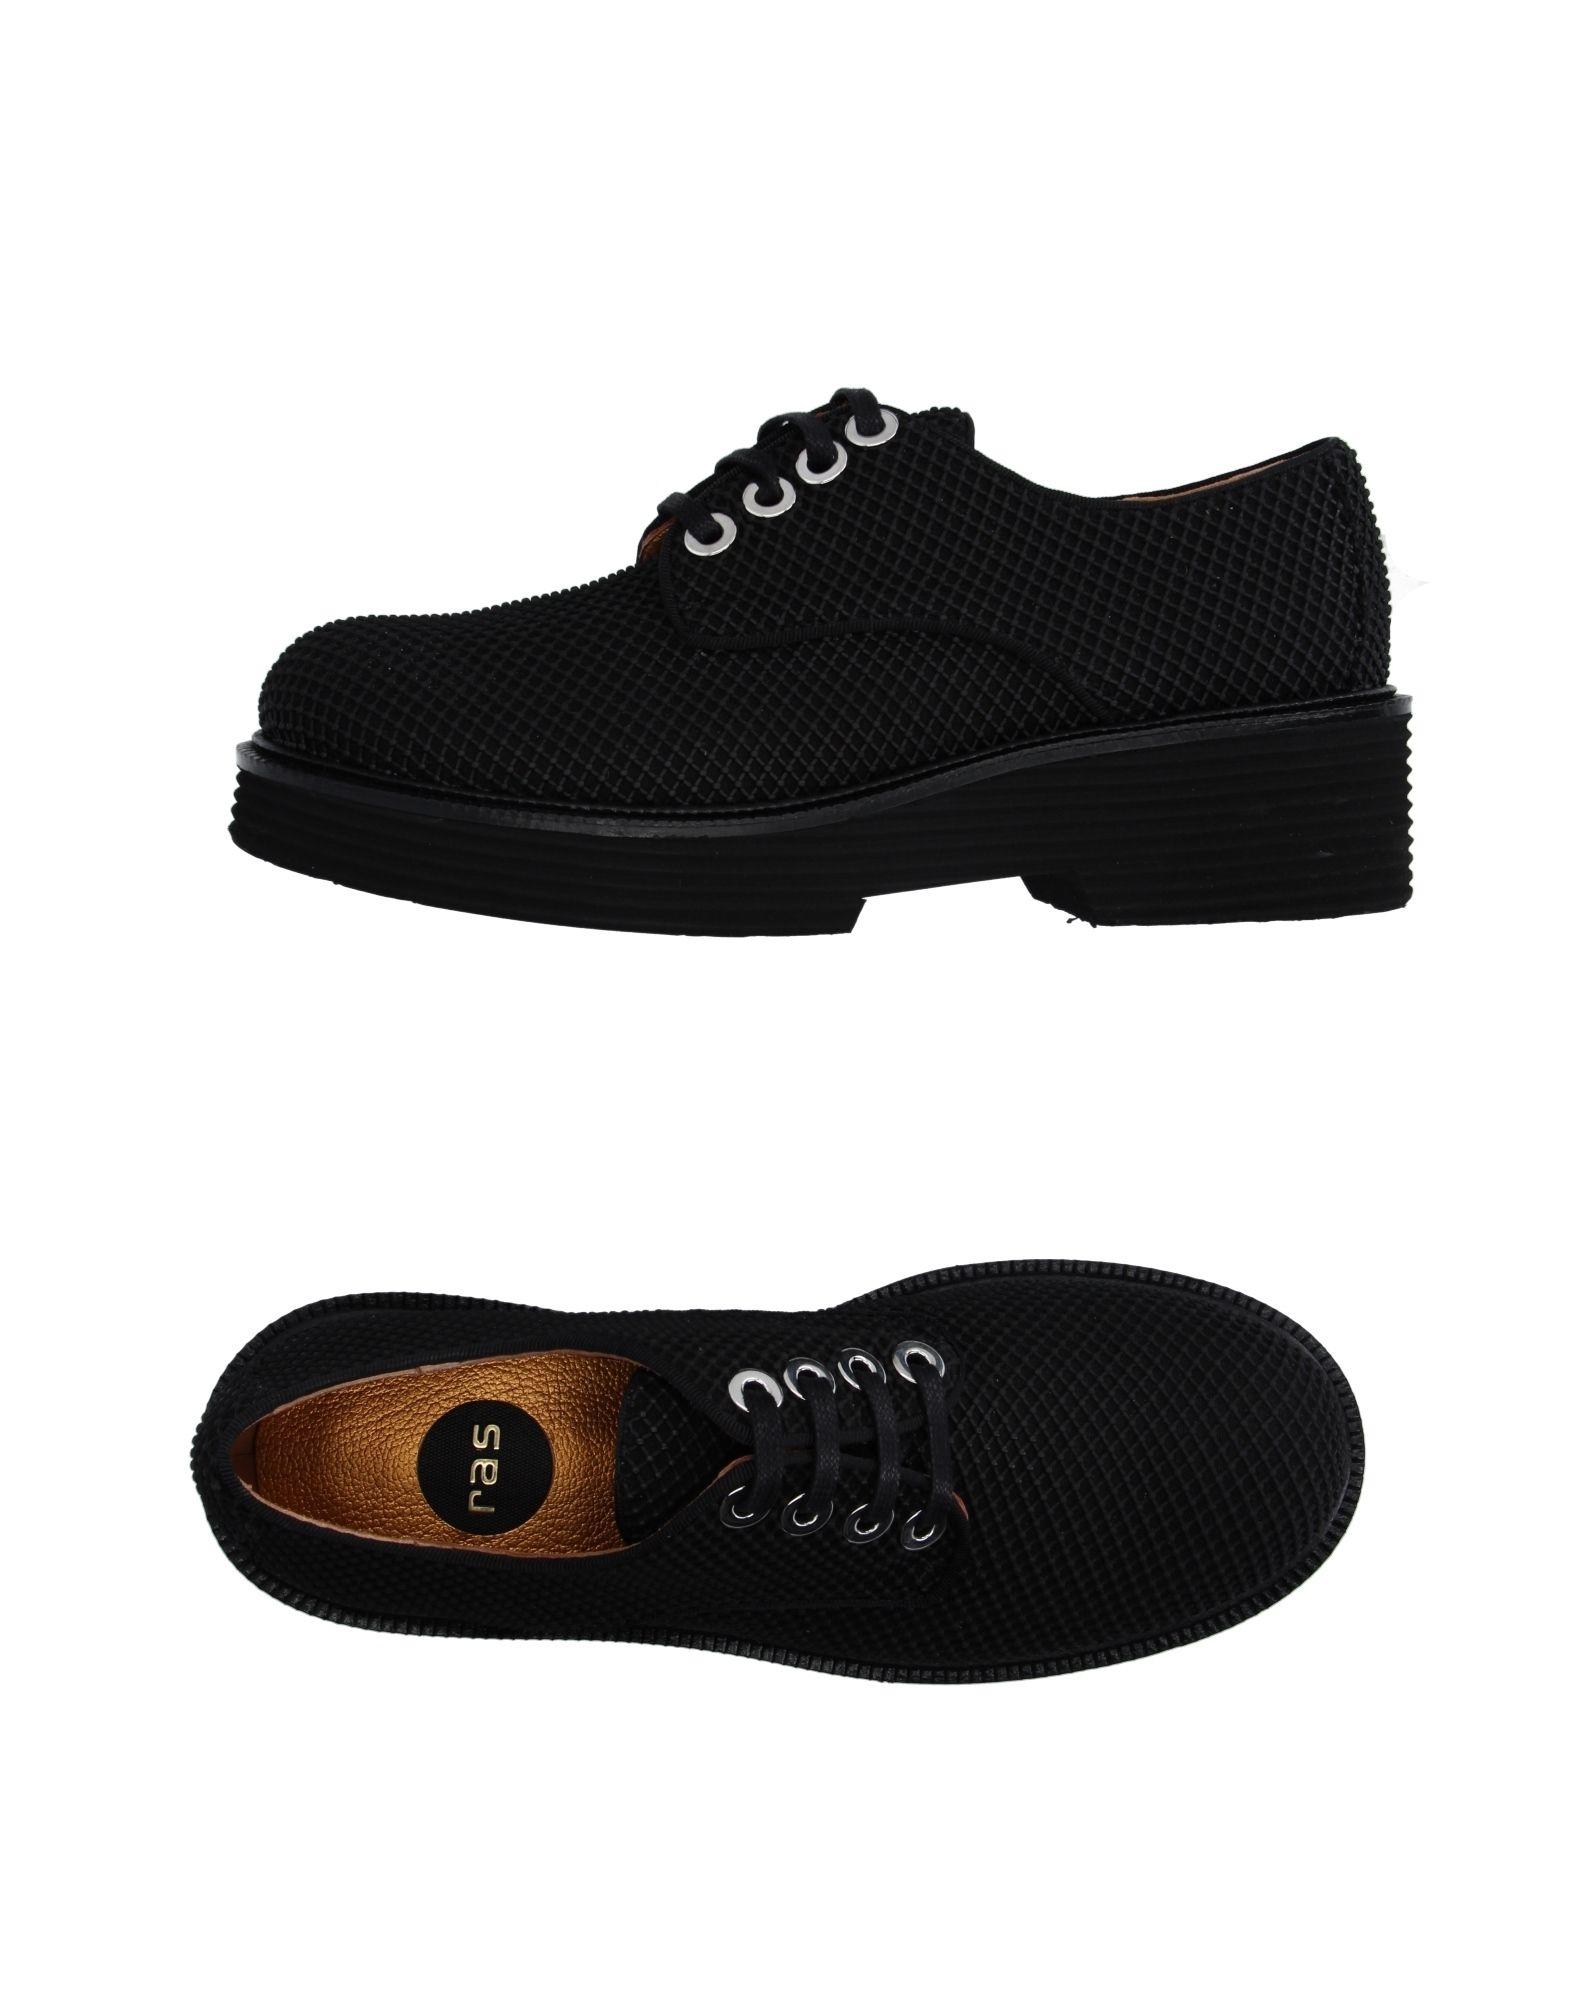 Ras Schnürschuhe Damen  11104632CE Gute Qualität beliebte Schuhe